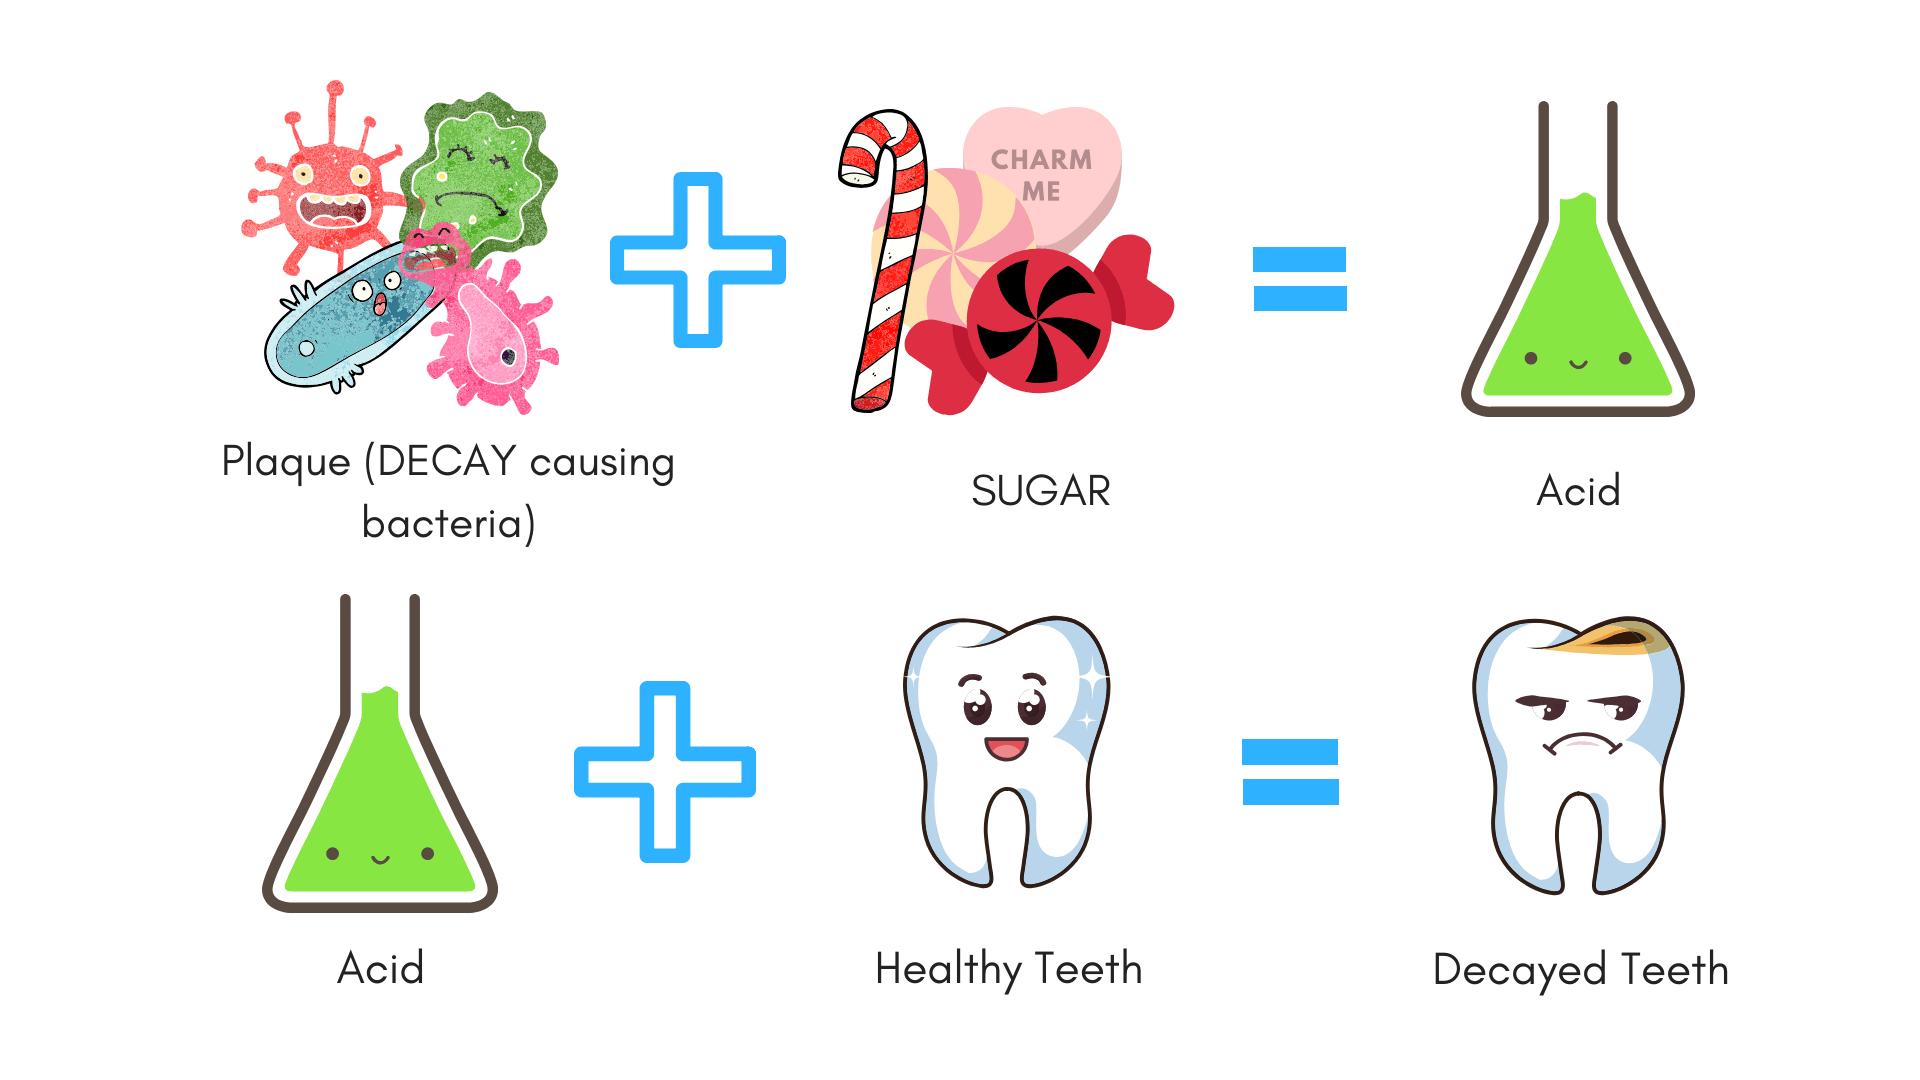 Germs Plus Sugar Acid Tooth Decay